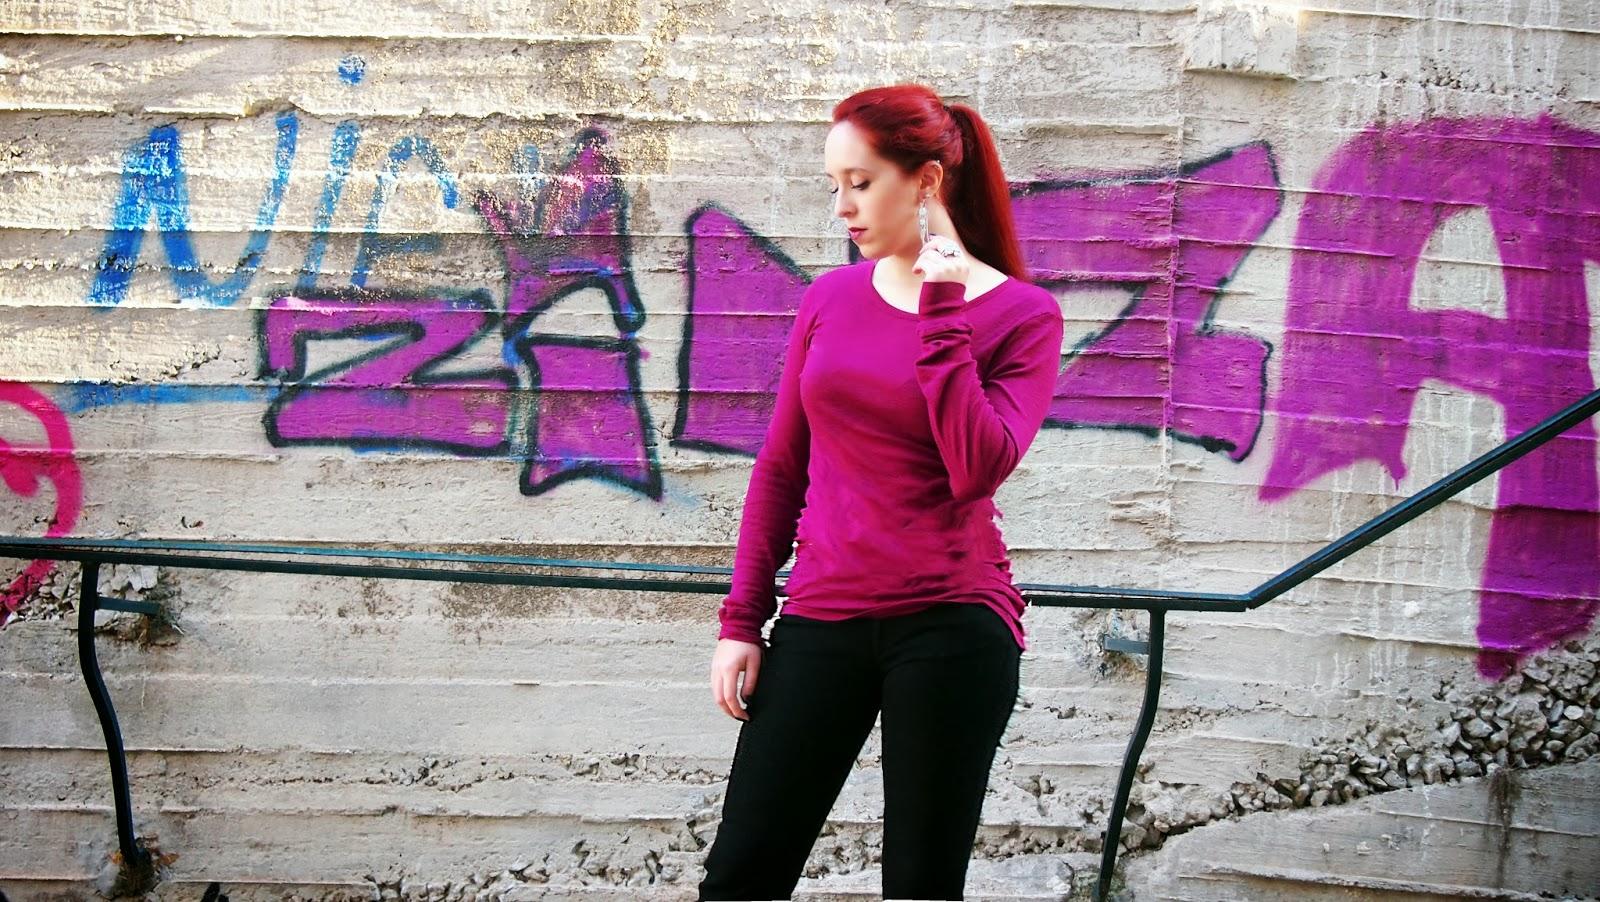 Anna ,Keni,redhead, spotlights on the redhead,fashion,model,blogger,  migato, clothes, outfit, Dyrberg, Kern, Dyrberg Kern, Purple, American Vintage, Wrangler, Ne me réveillé pas, Mirage, closeups, photoshoot,